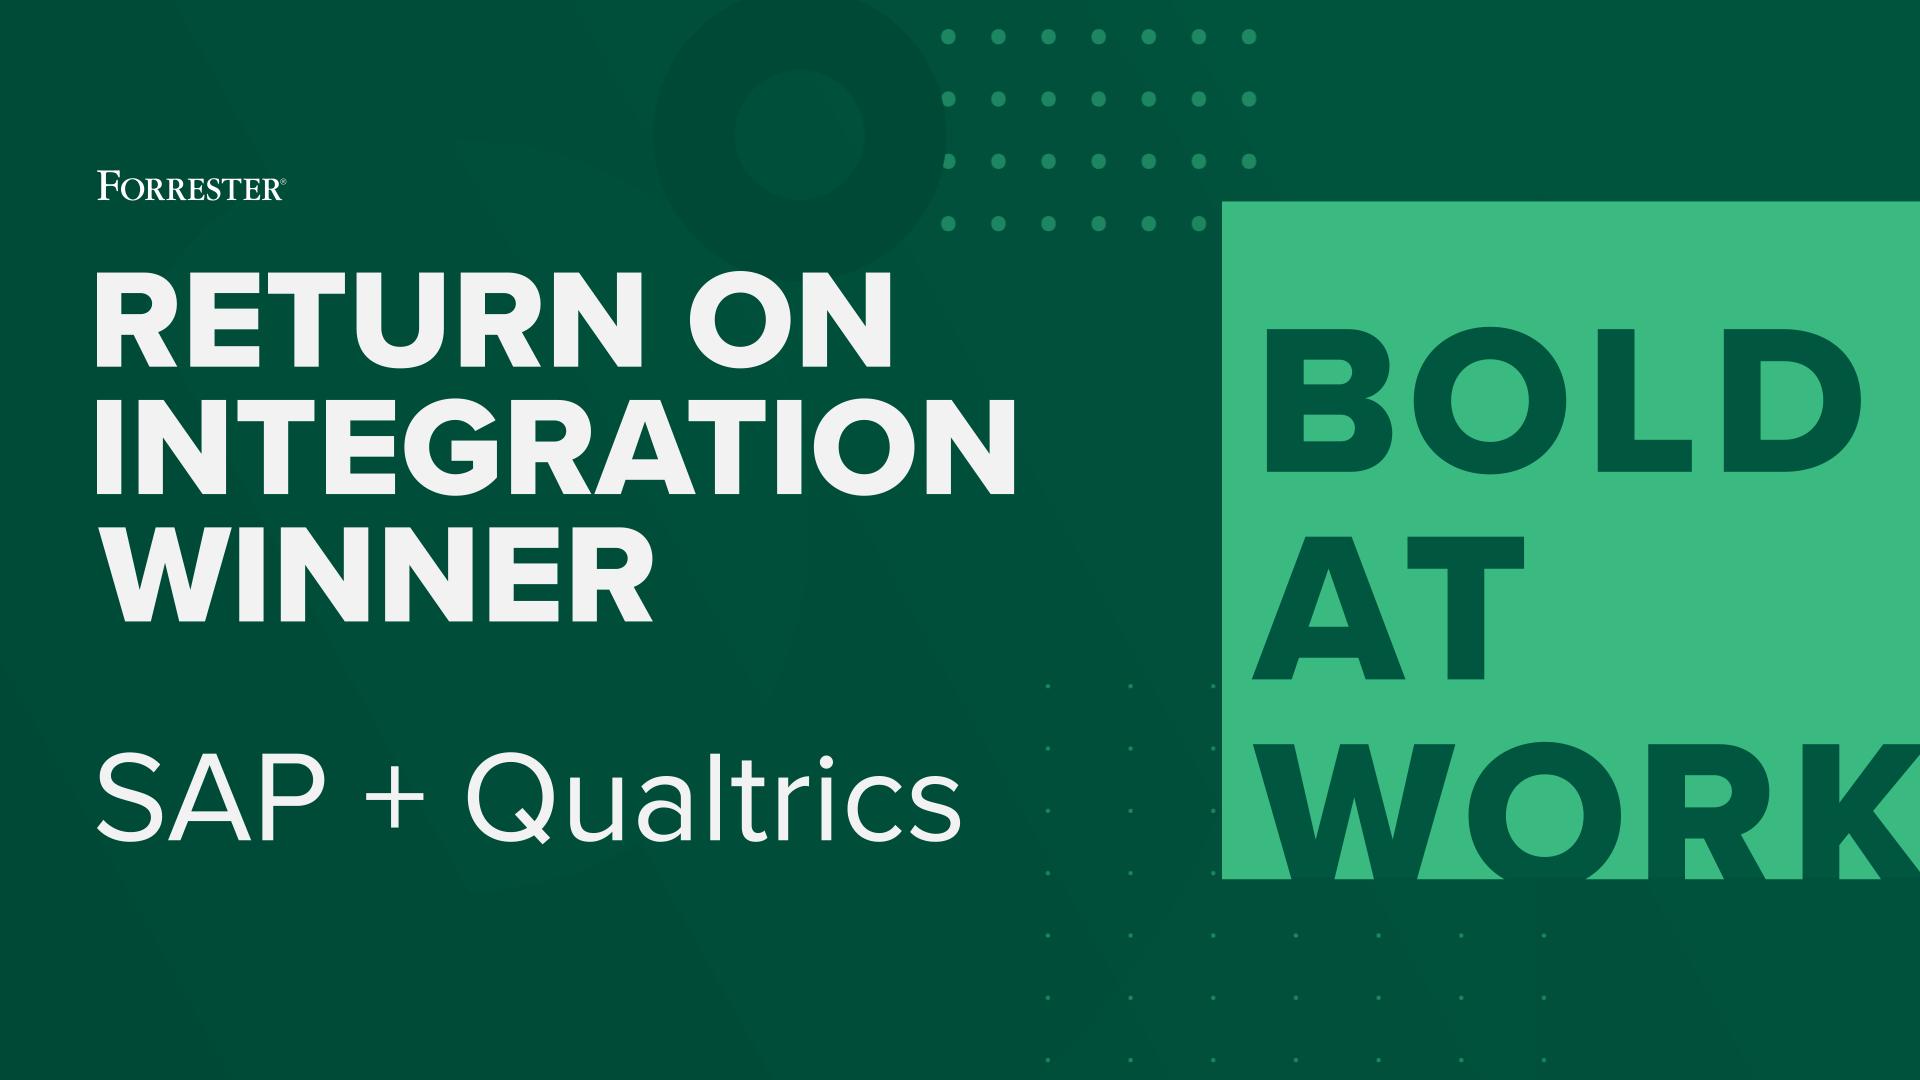 ROI Award Winner SAP + Qualtrics